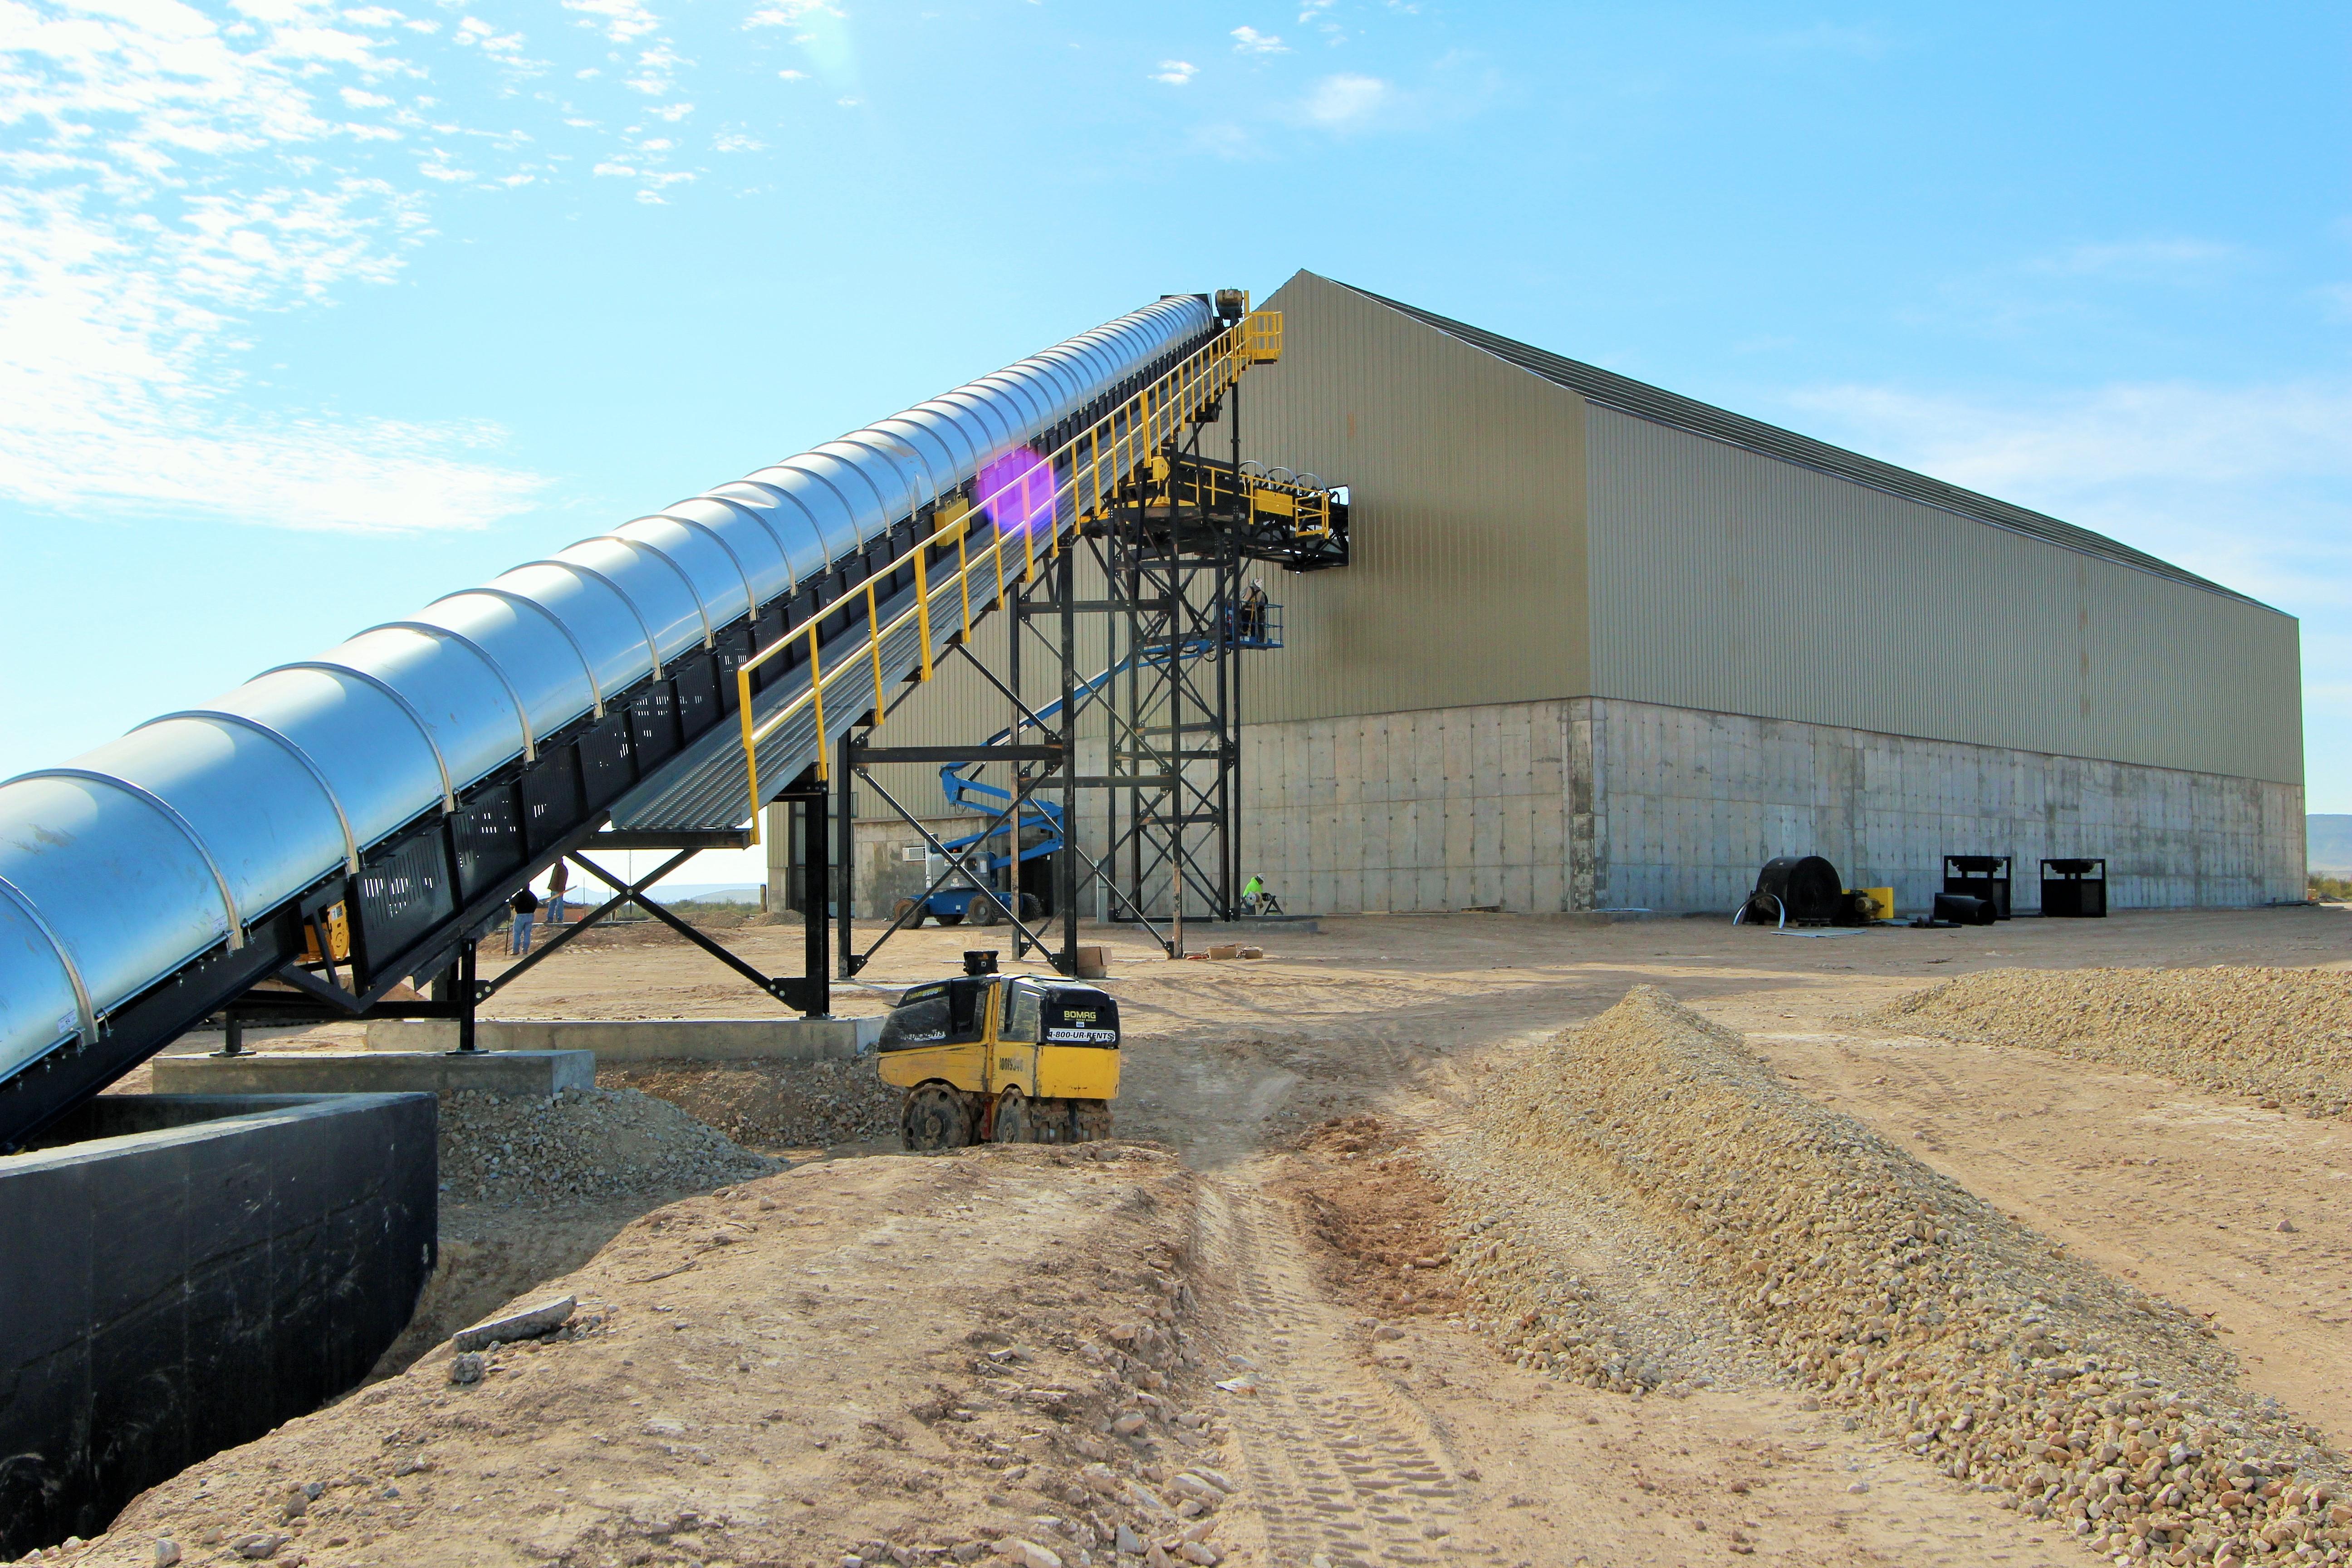 Fort Stockton facility completes 10000-ton storage expansion | Titan Lansing Transloading Permian frac sand transloading and storage & Fort Stockton facility completes 10000-ton storage expansion ...